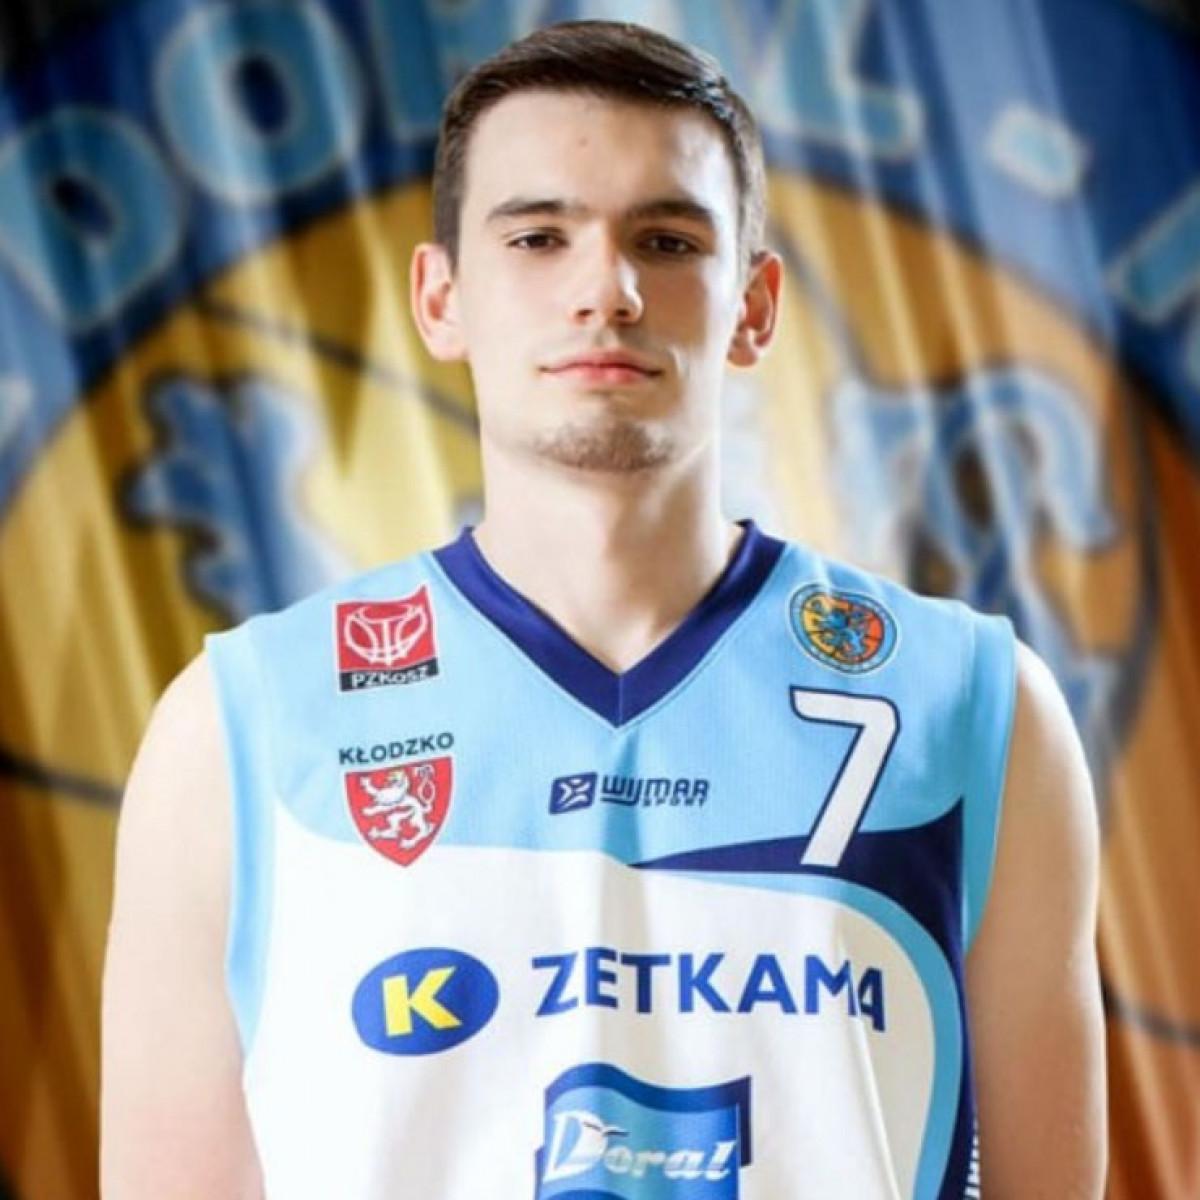 Photo of Dominik Rutkowski, 2017-2018 season